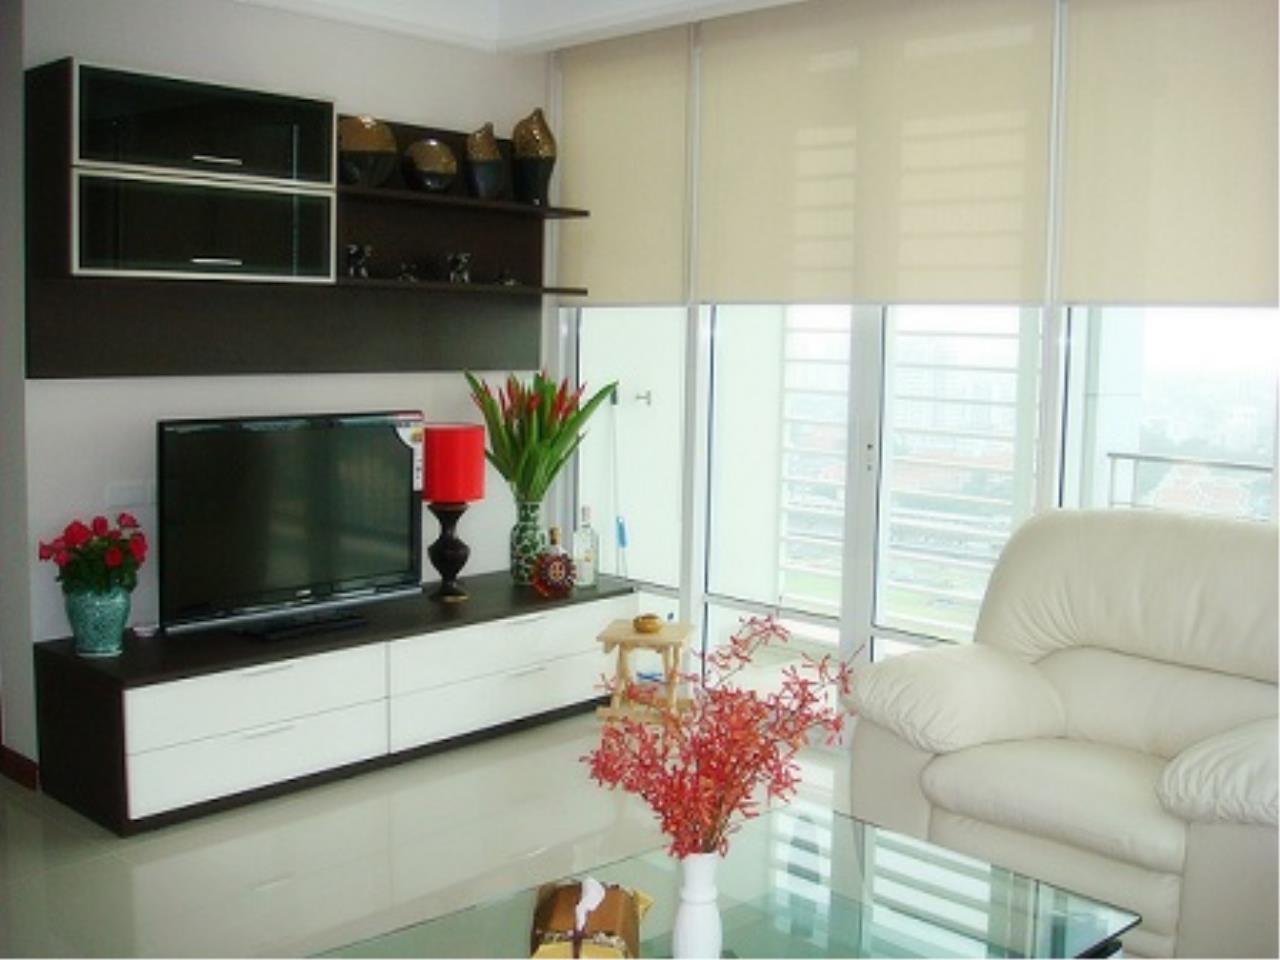 Right Move Thailand Agency's CS1947 Anatara Baan Rajprasong 2 Bedrooms For Sale 13,900,000 THB 1